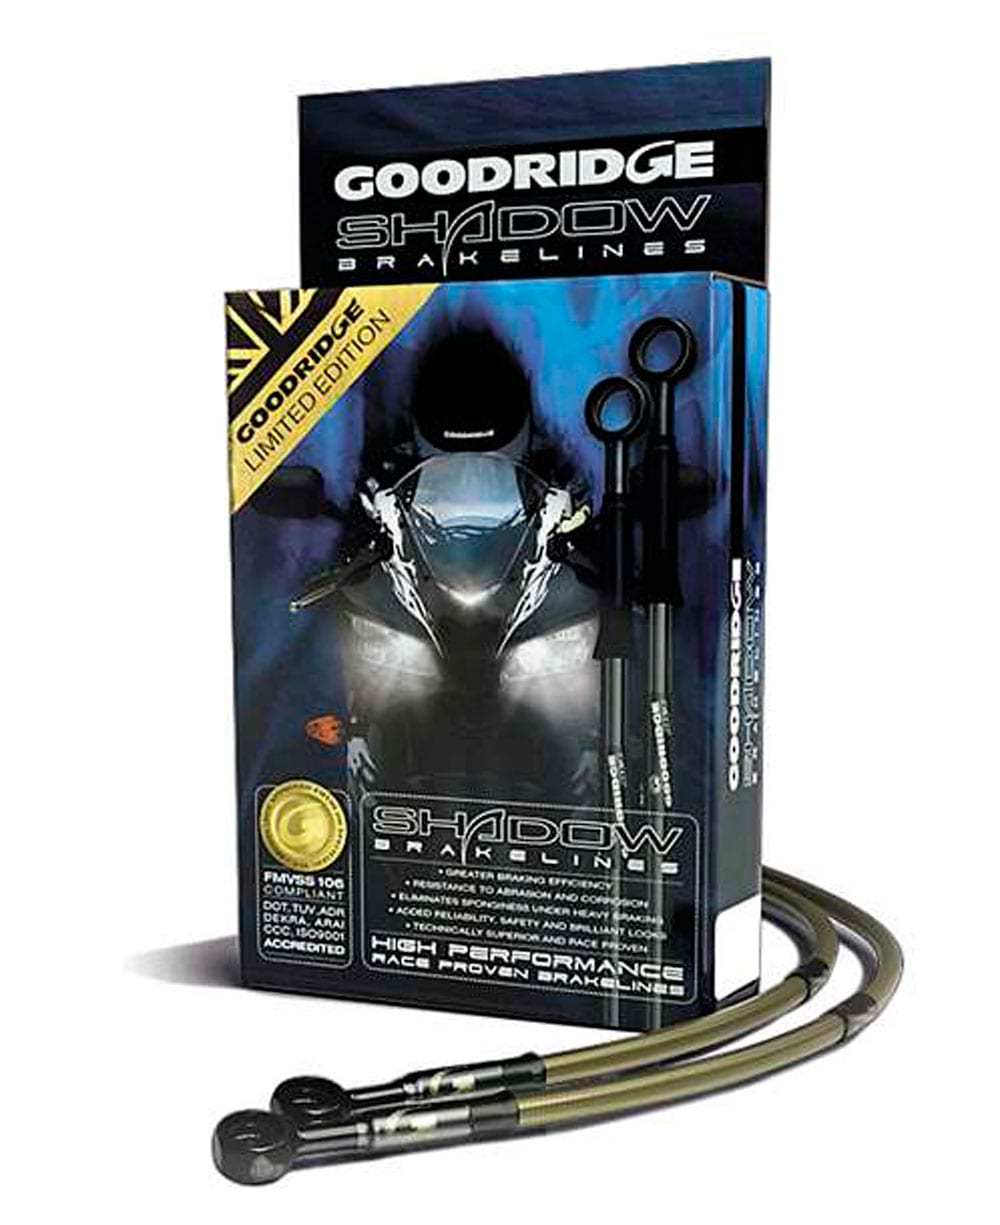 GOODRIDGE-BRAKE